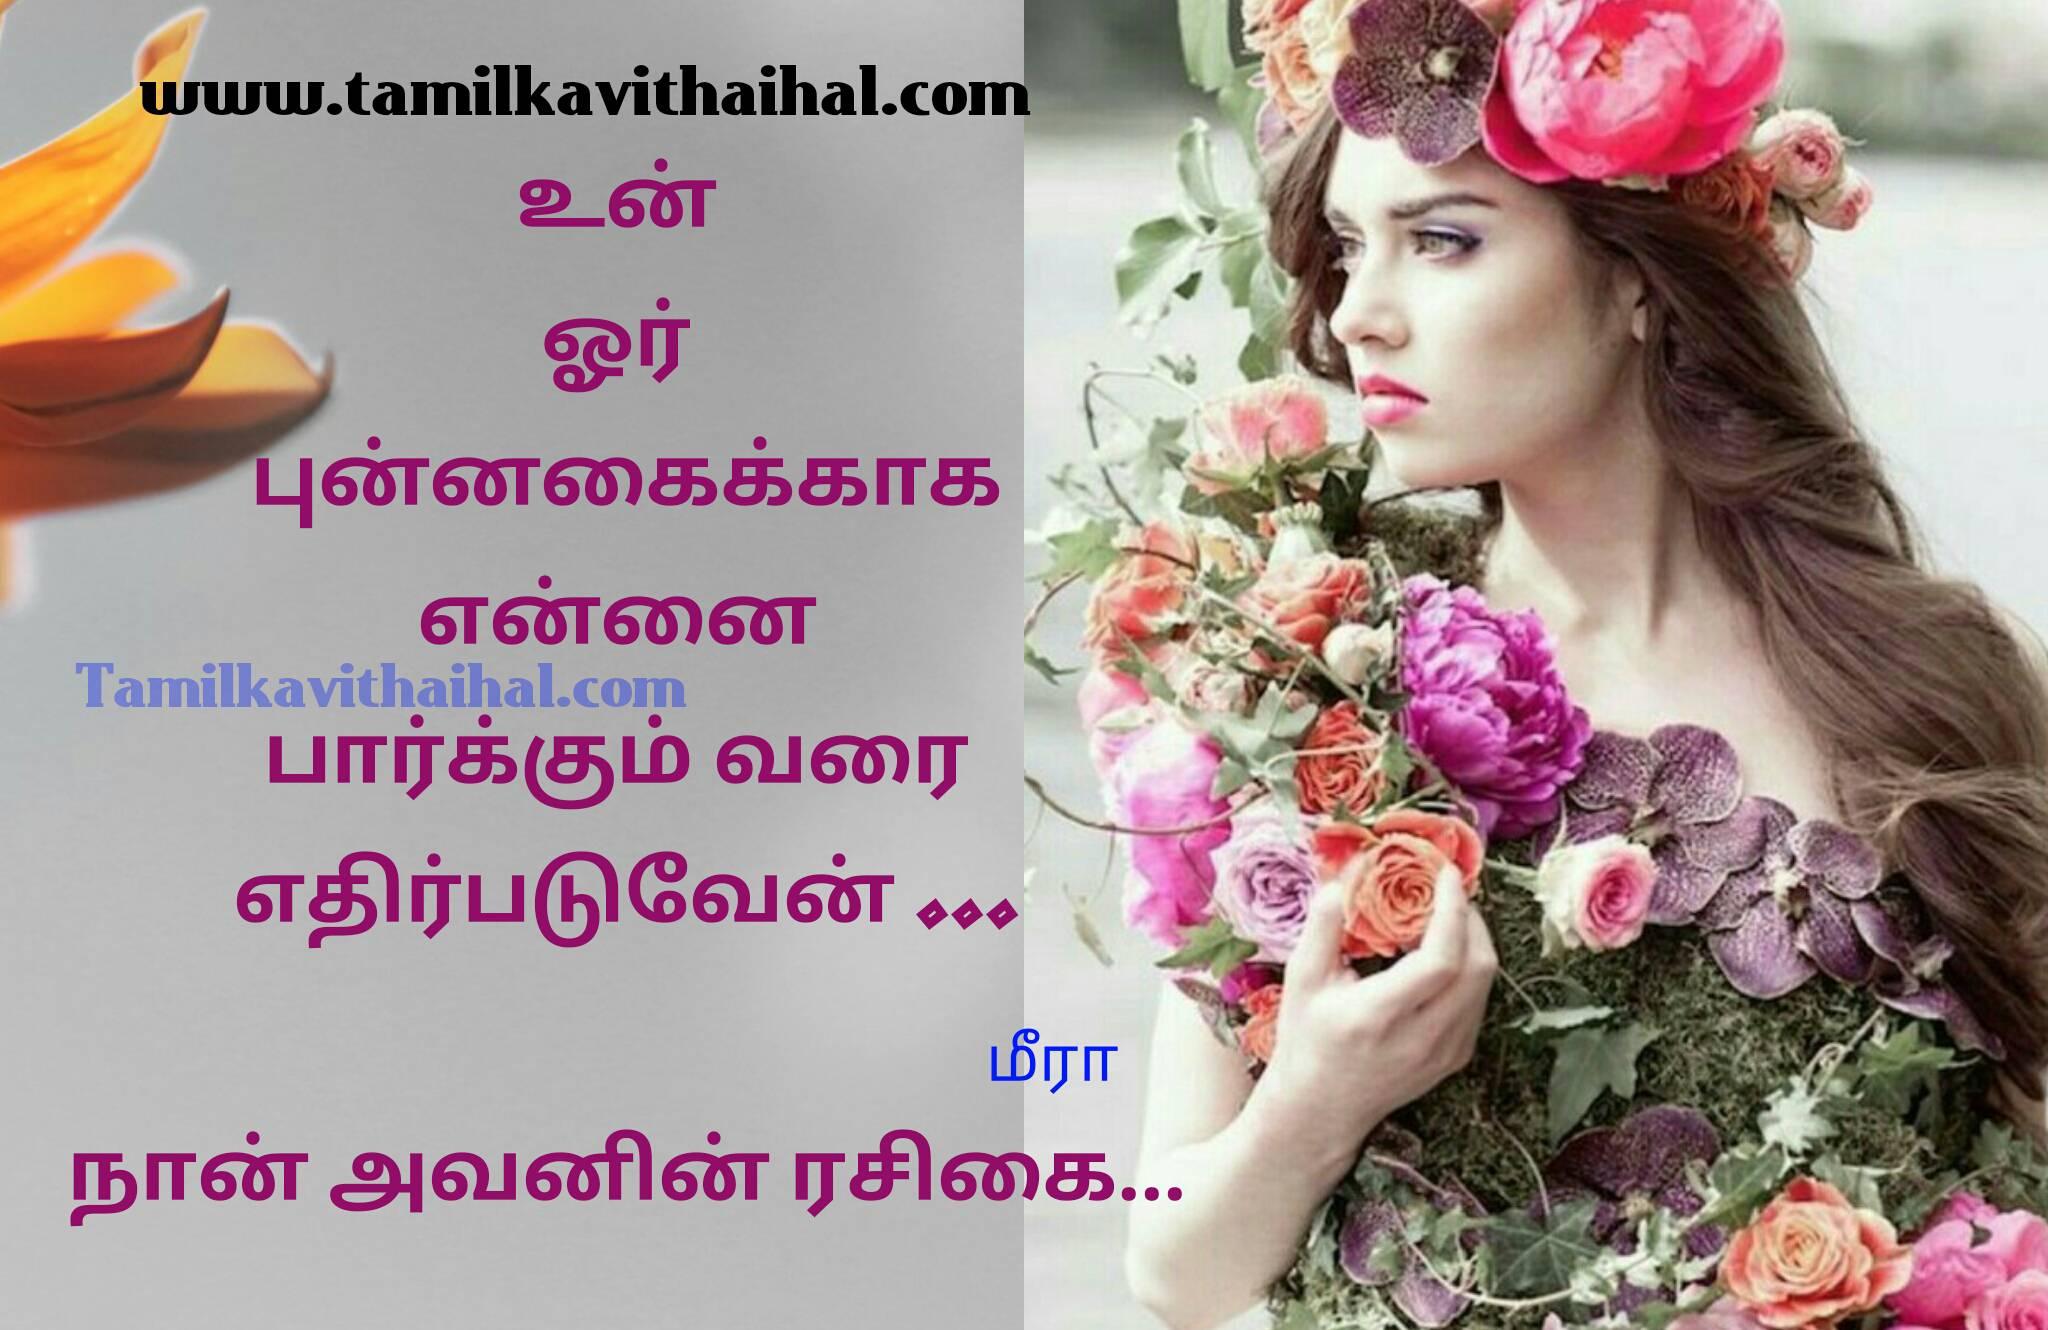 Cute love feel romance kadhal kavithaigal punnakai smile avan rasikai meera tamil quotes image